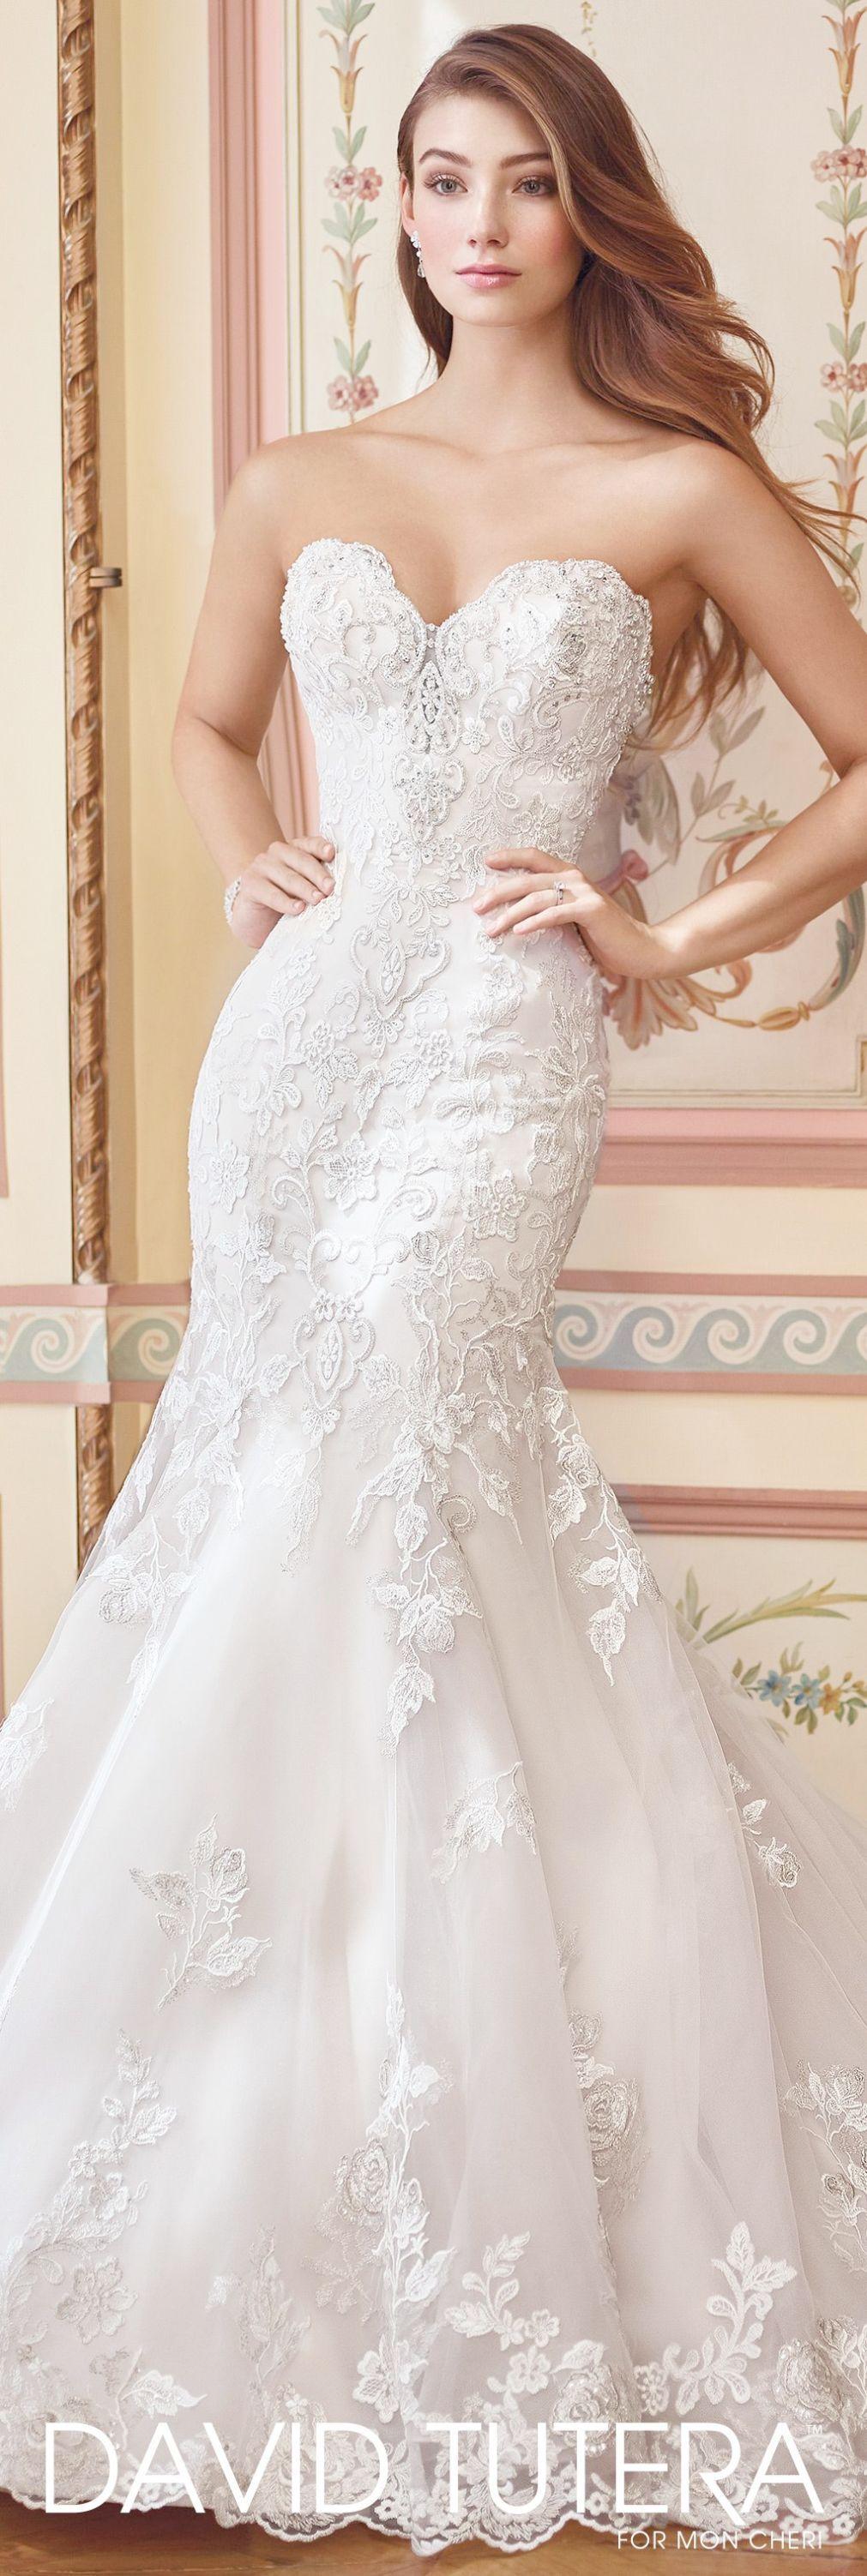 Lace sweetheart wedding dress long sleeve lace mermaid wedding dress